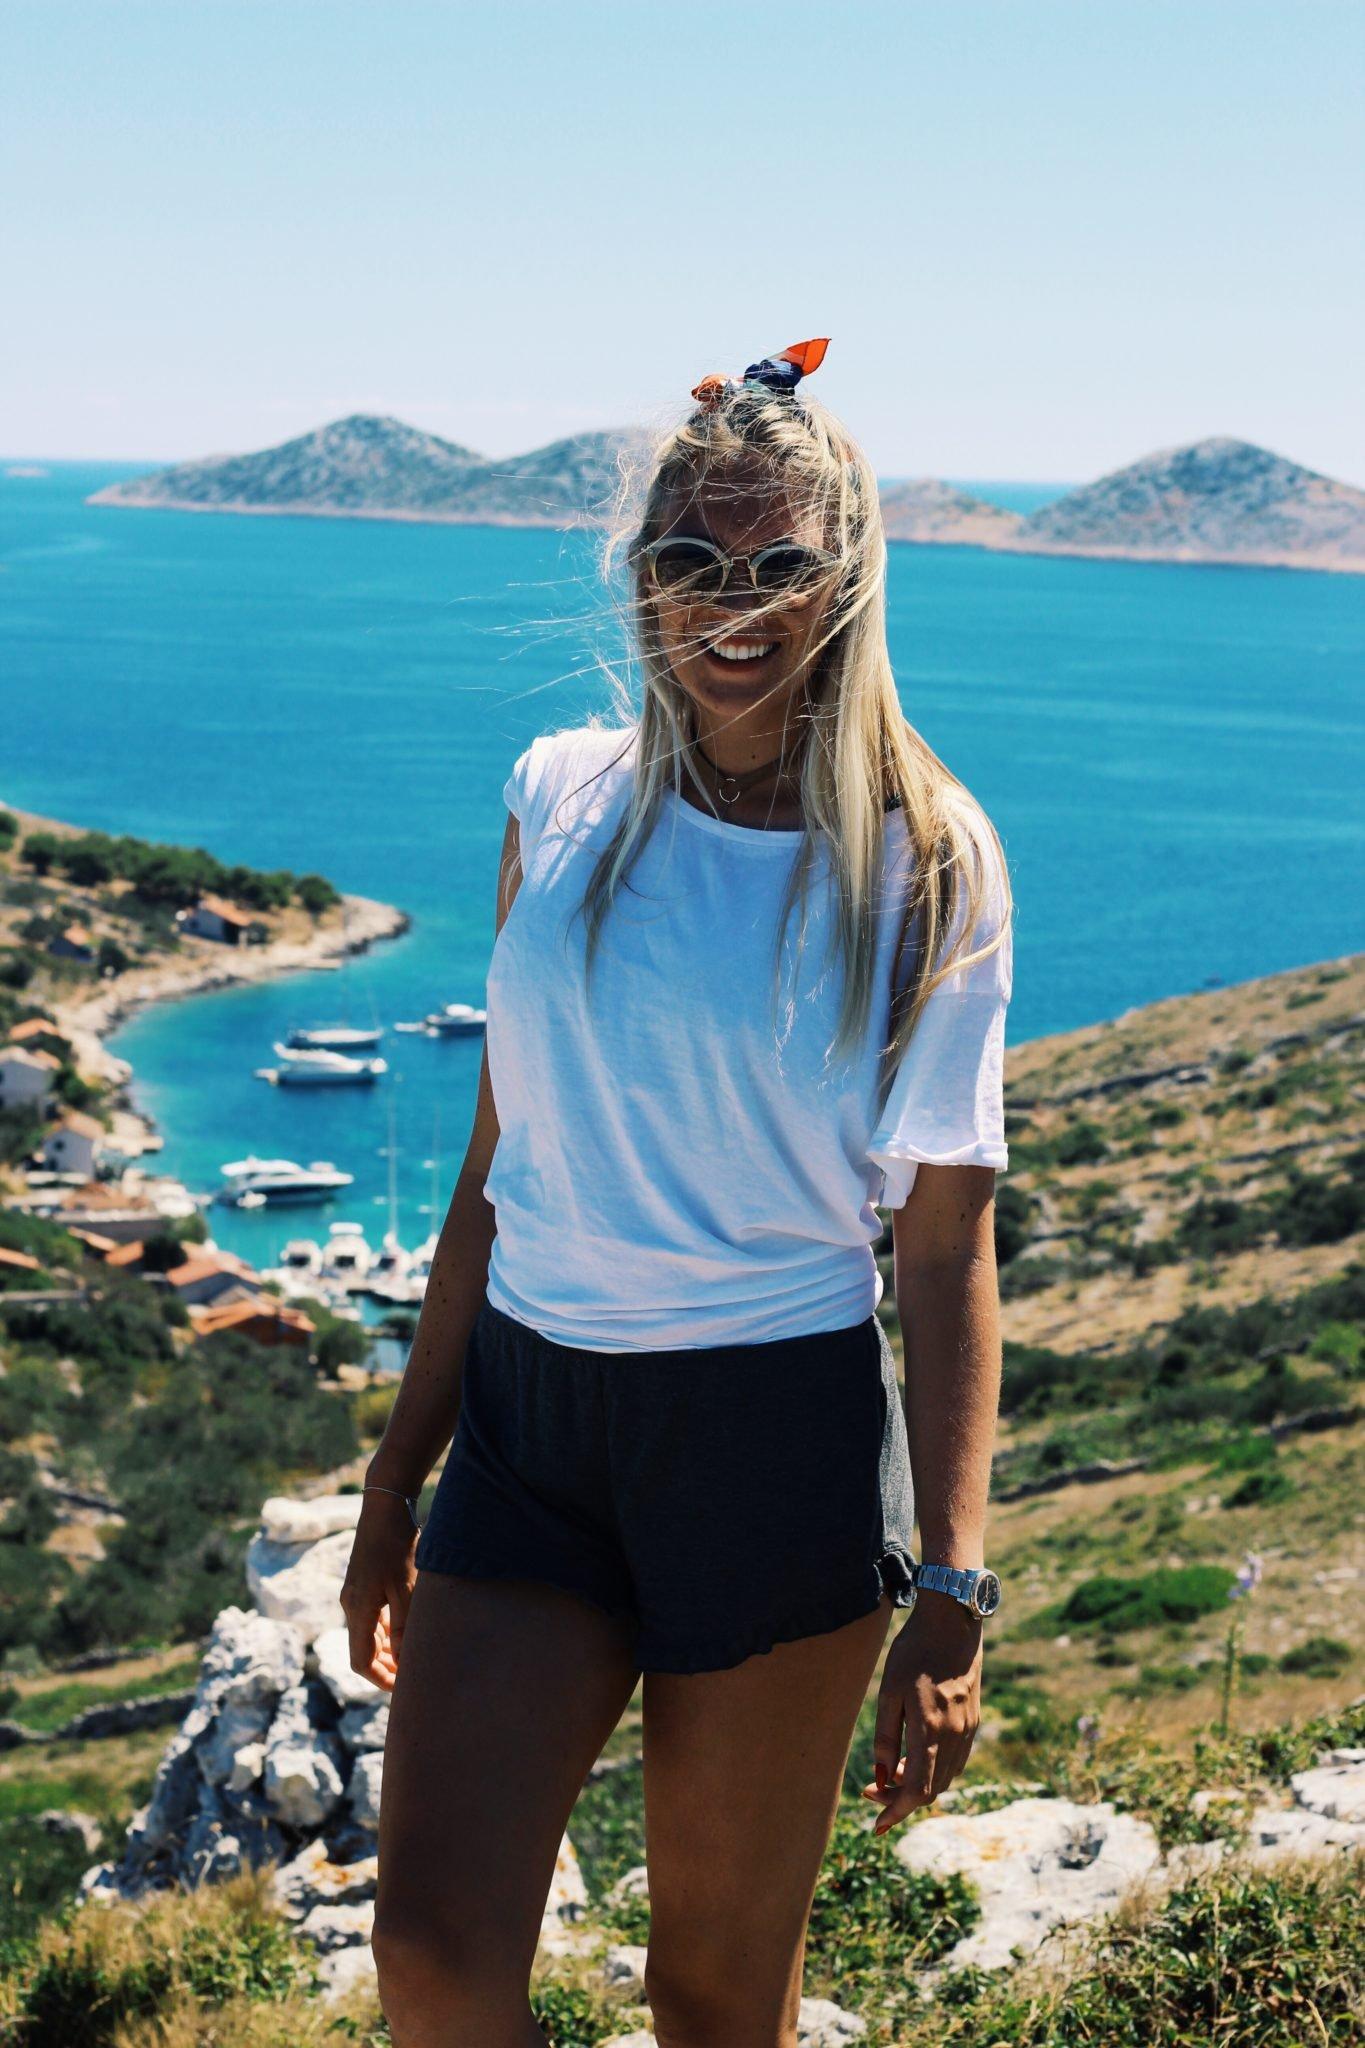 Holiday croatia 2016 - 5 6